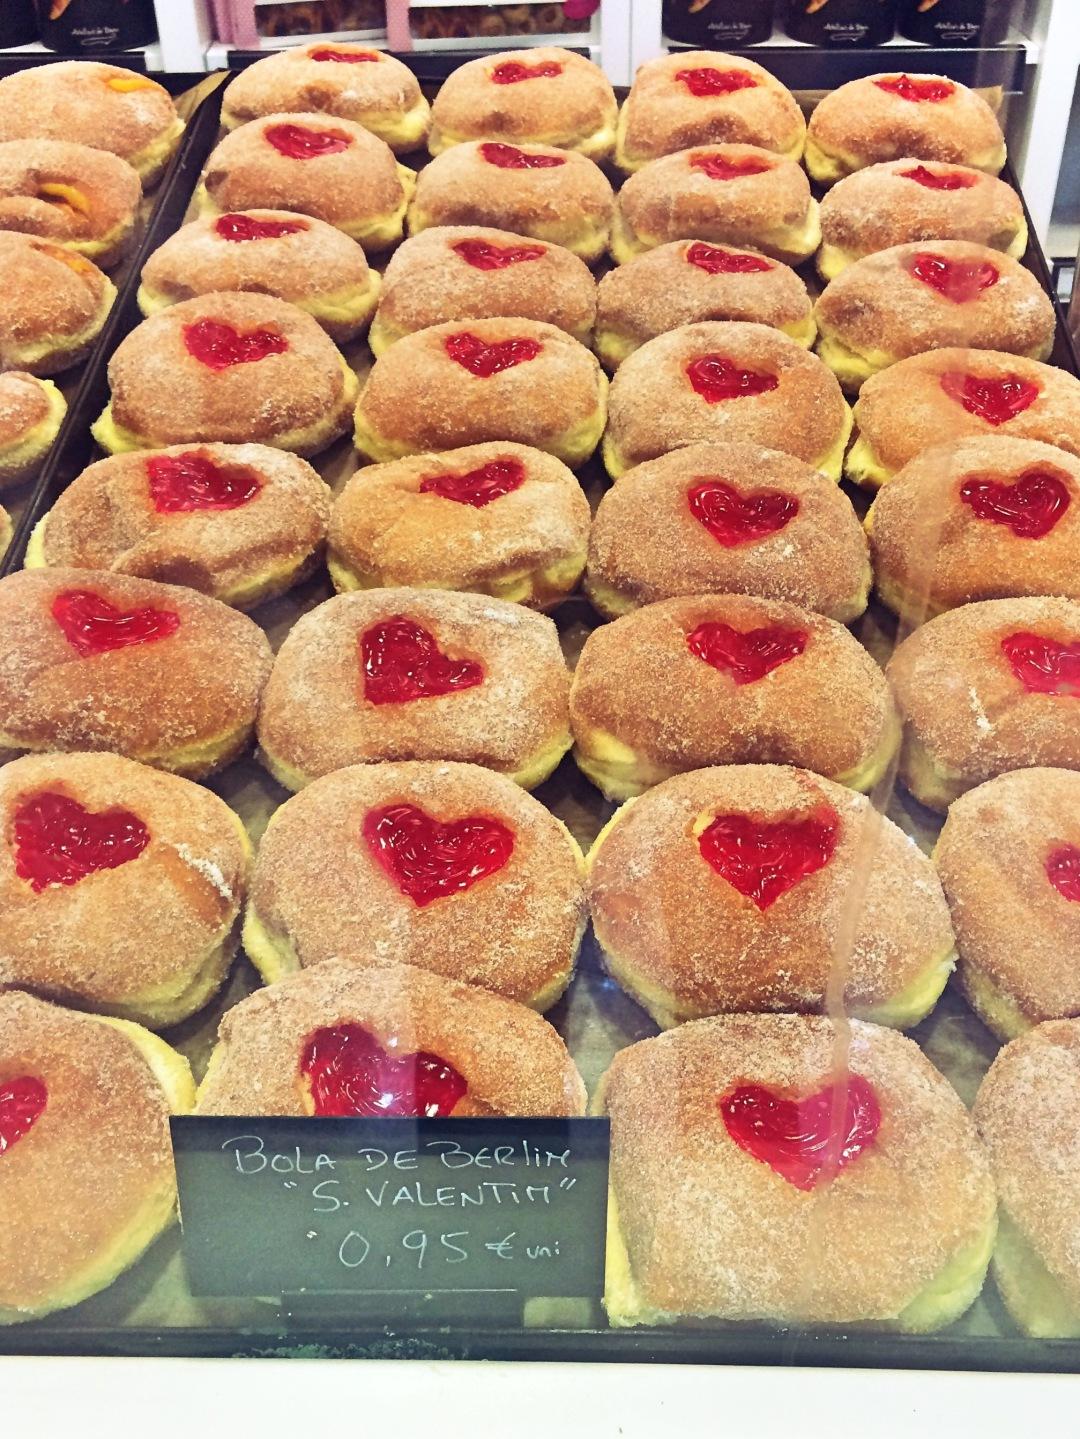 Valentine's Day bolas de Berlim